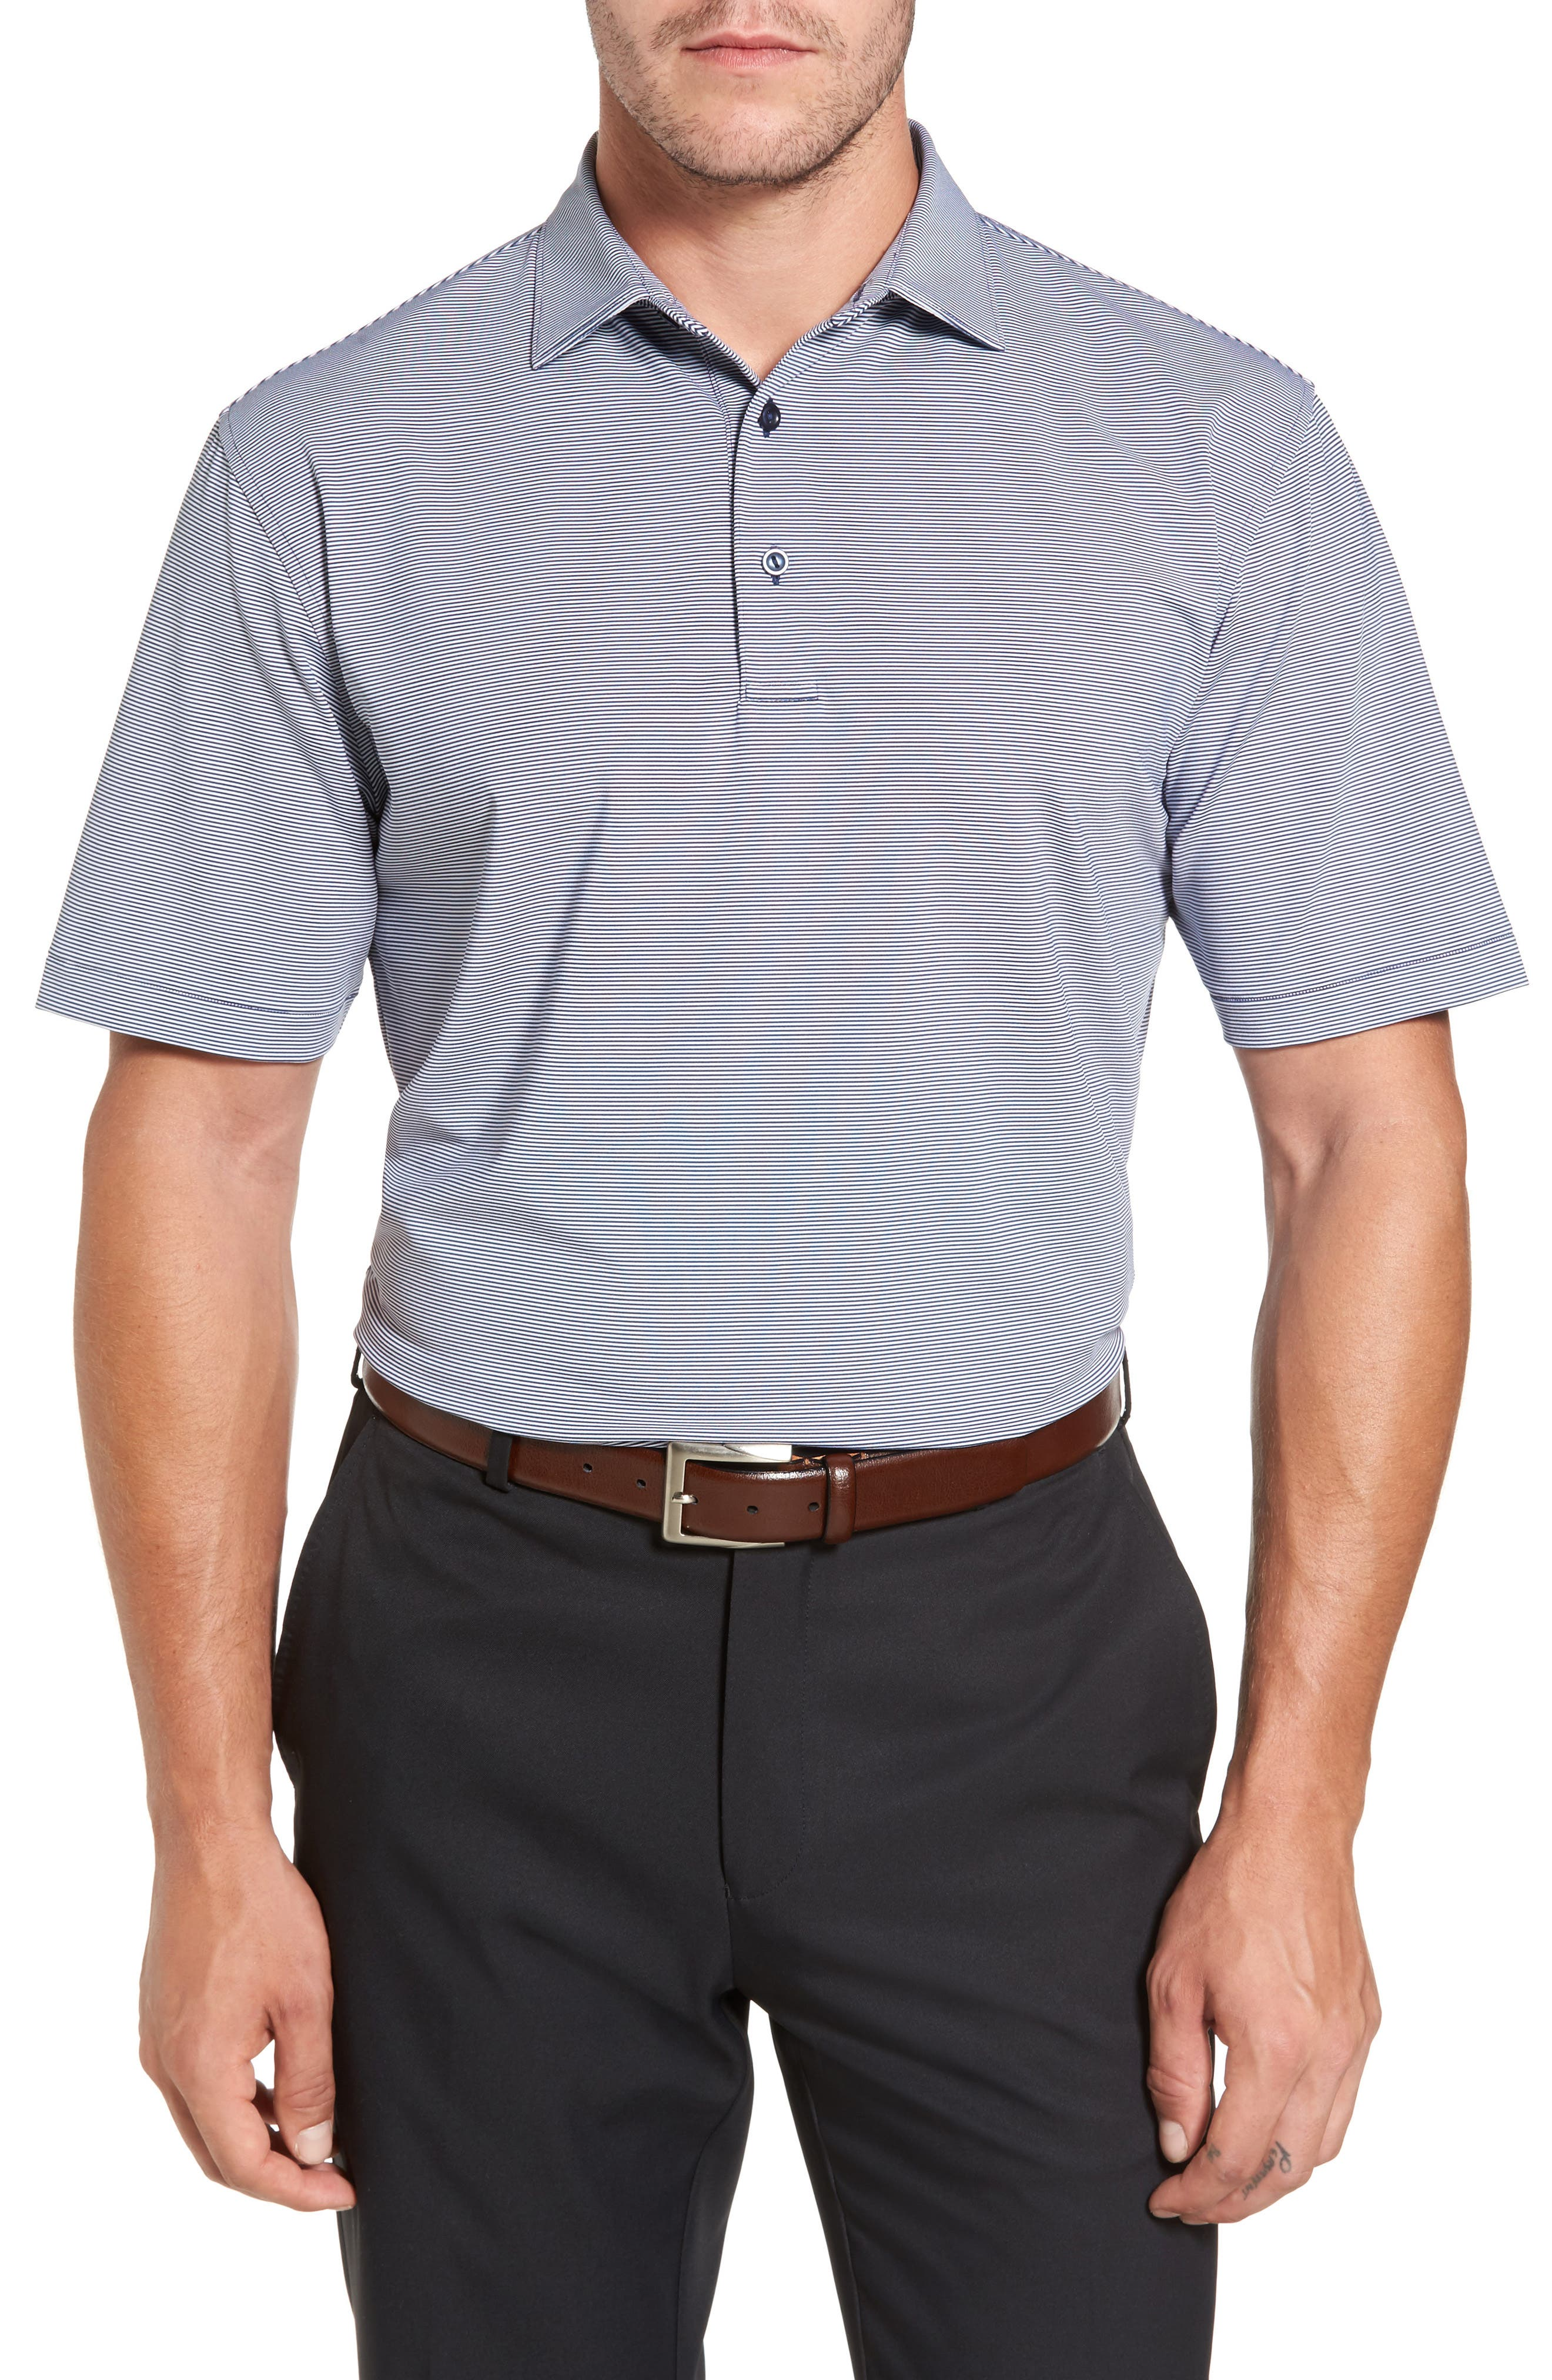 Alternate Image 1 Selected - Peter Millar Sean Jubilee Stripe Jersey Polo